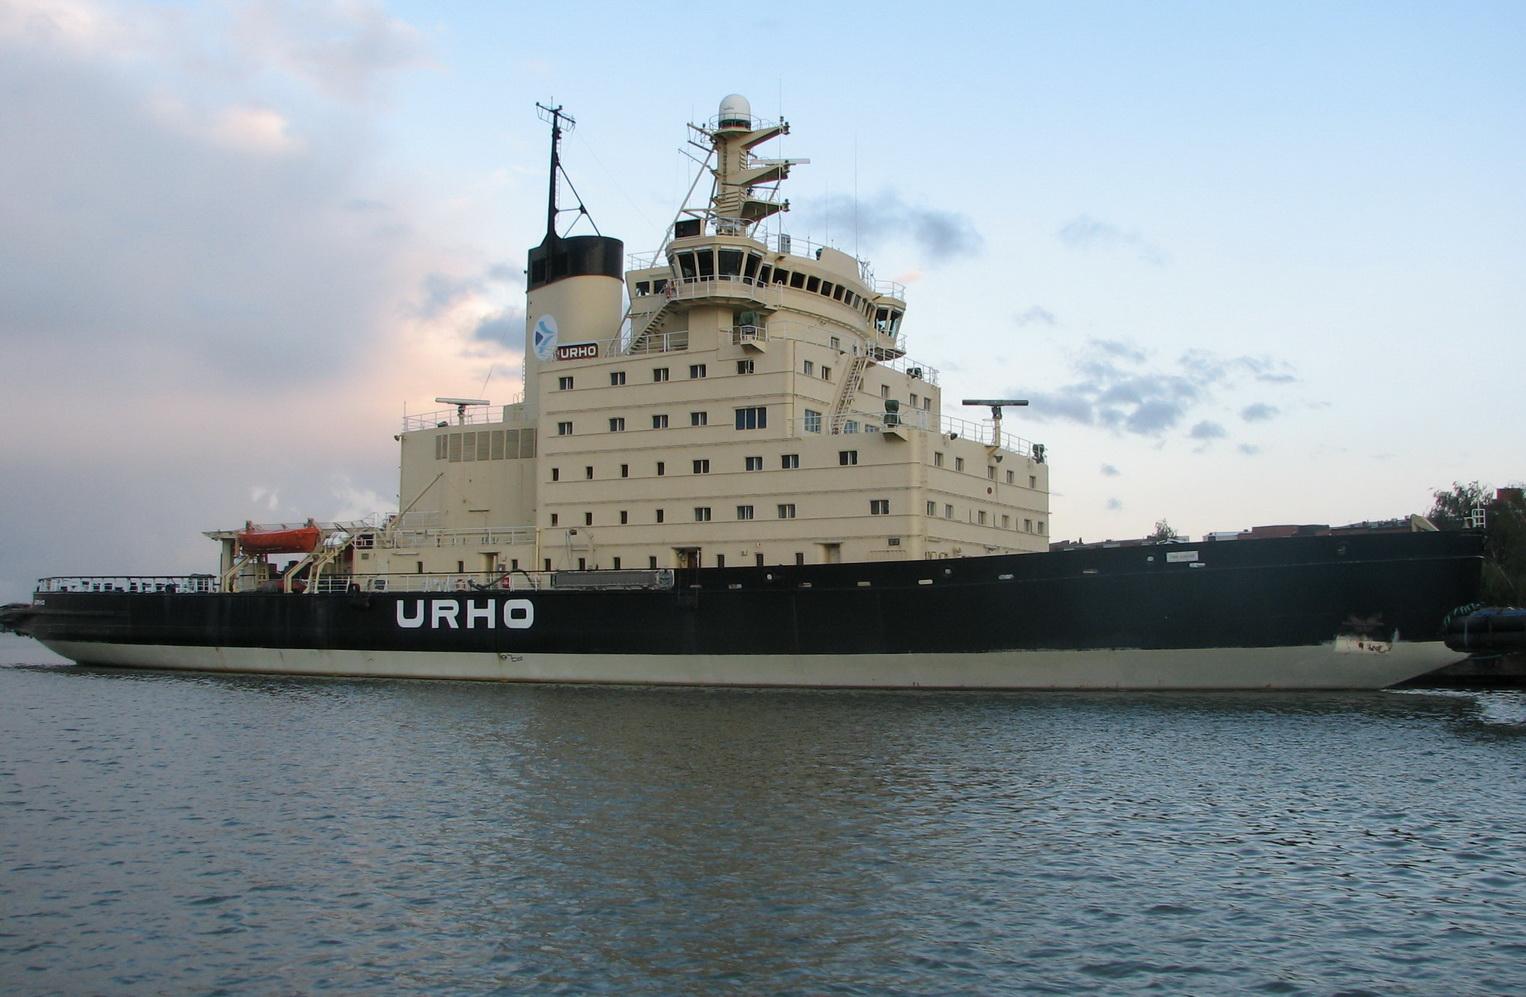 Ship+Photo+Urho4.jpg